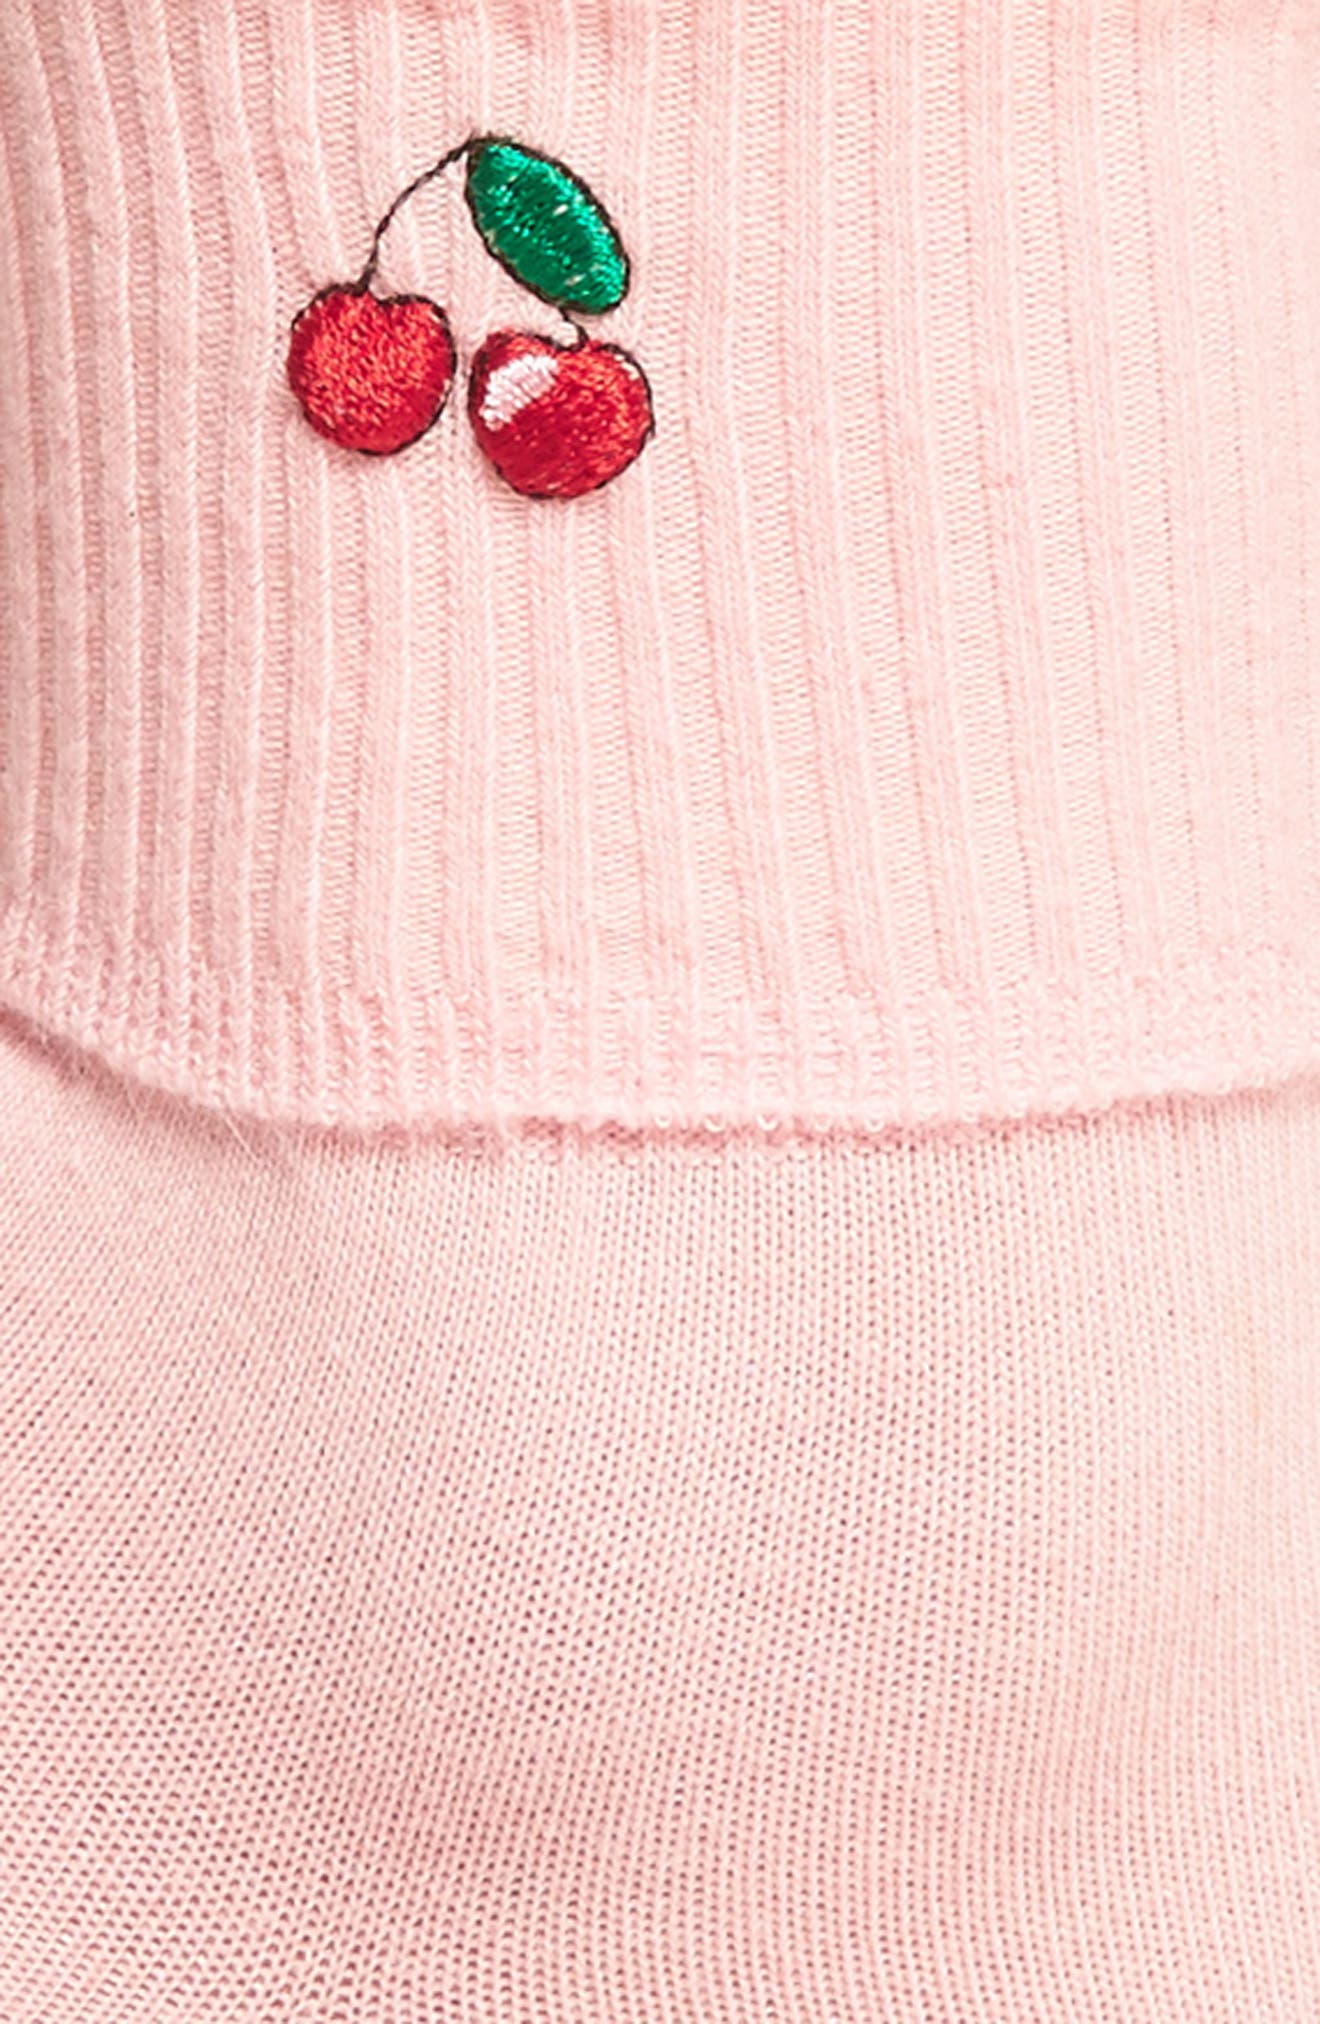 Cherry Socks,                             Alternate thumbnail 2, color,                             Pink/ Red